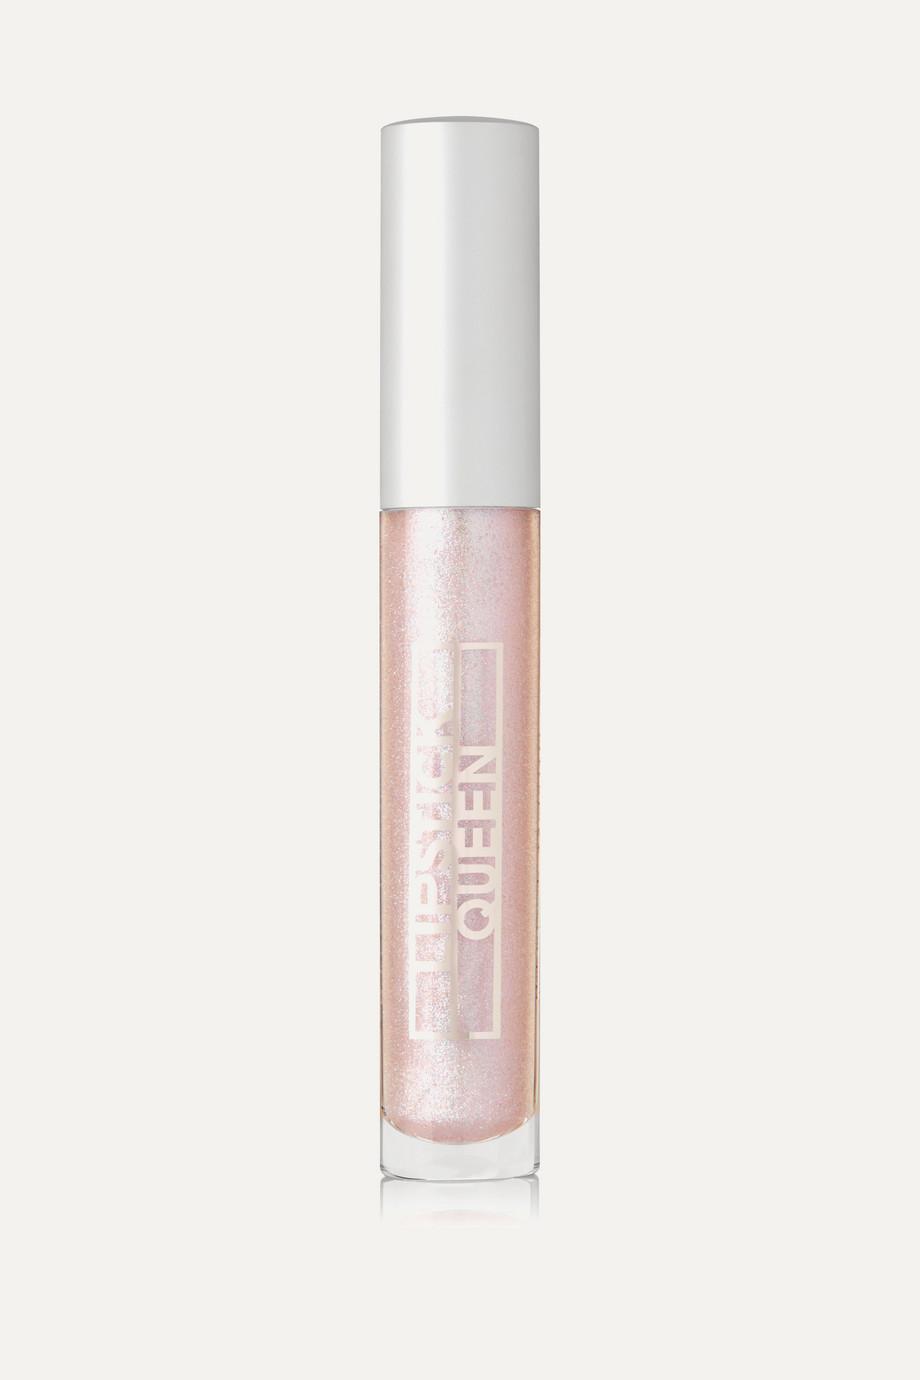 Lipstick Queen Altered Universe Lip Gloss – Time Warp – Lipgloss